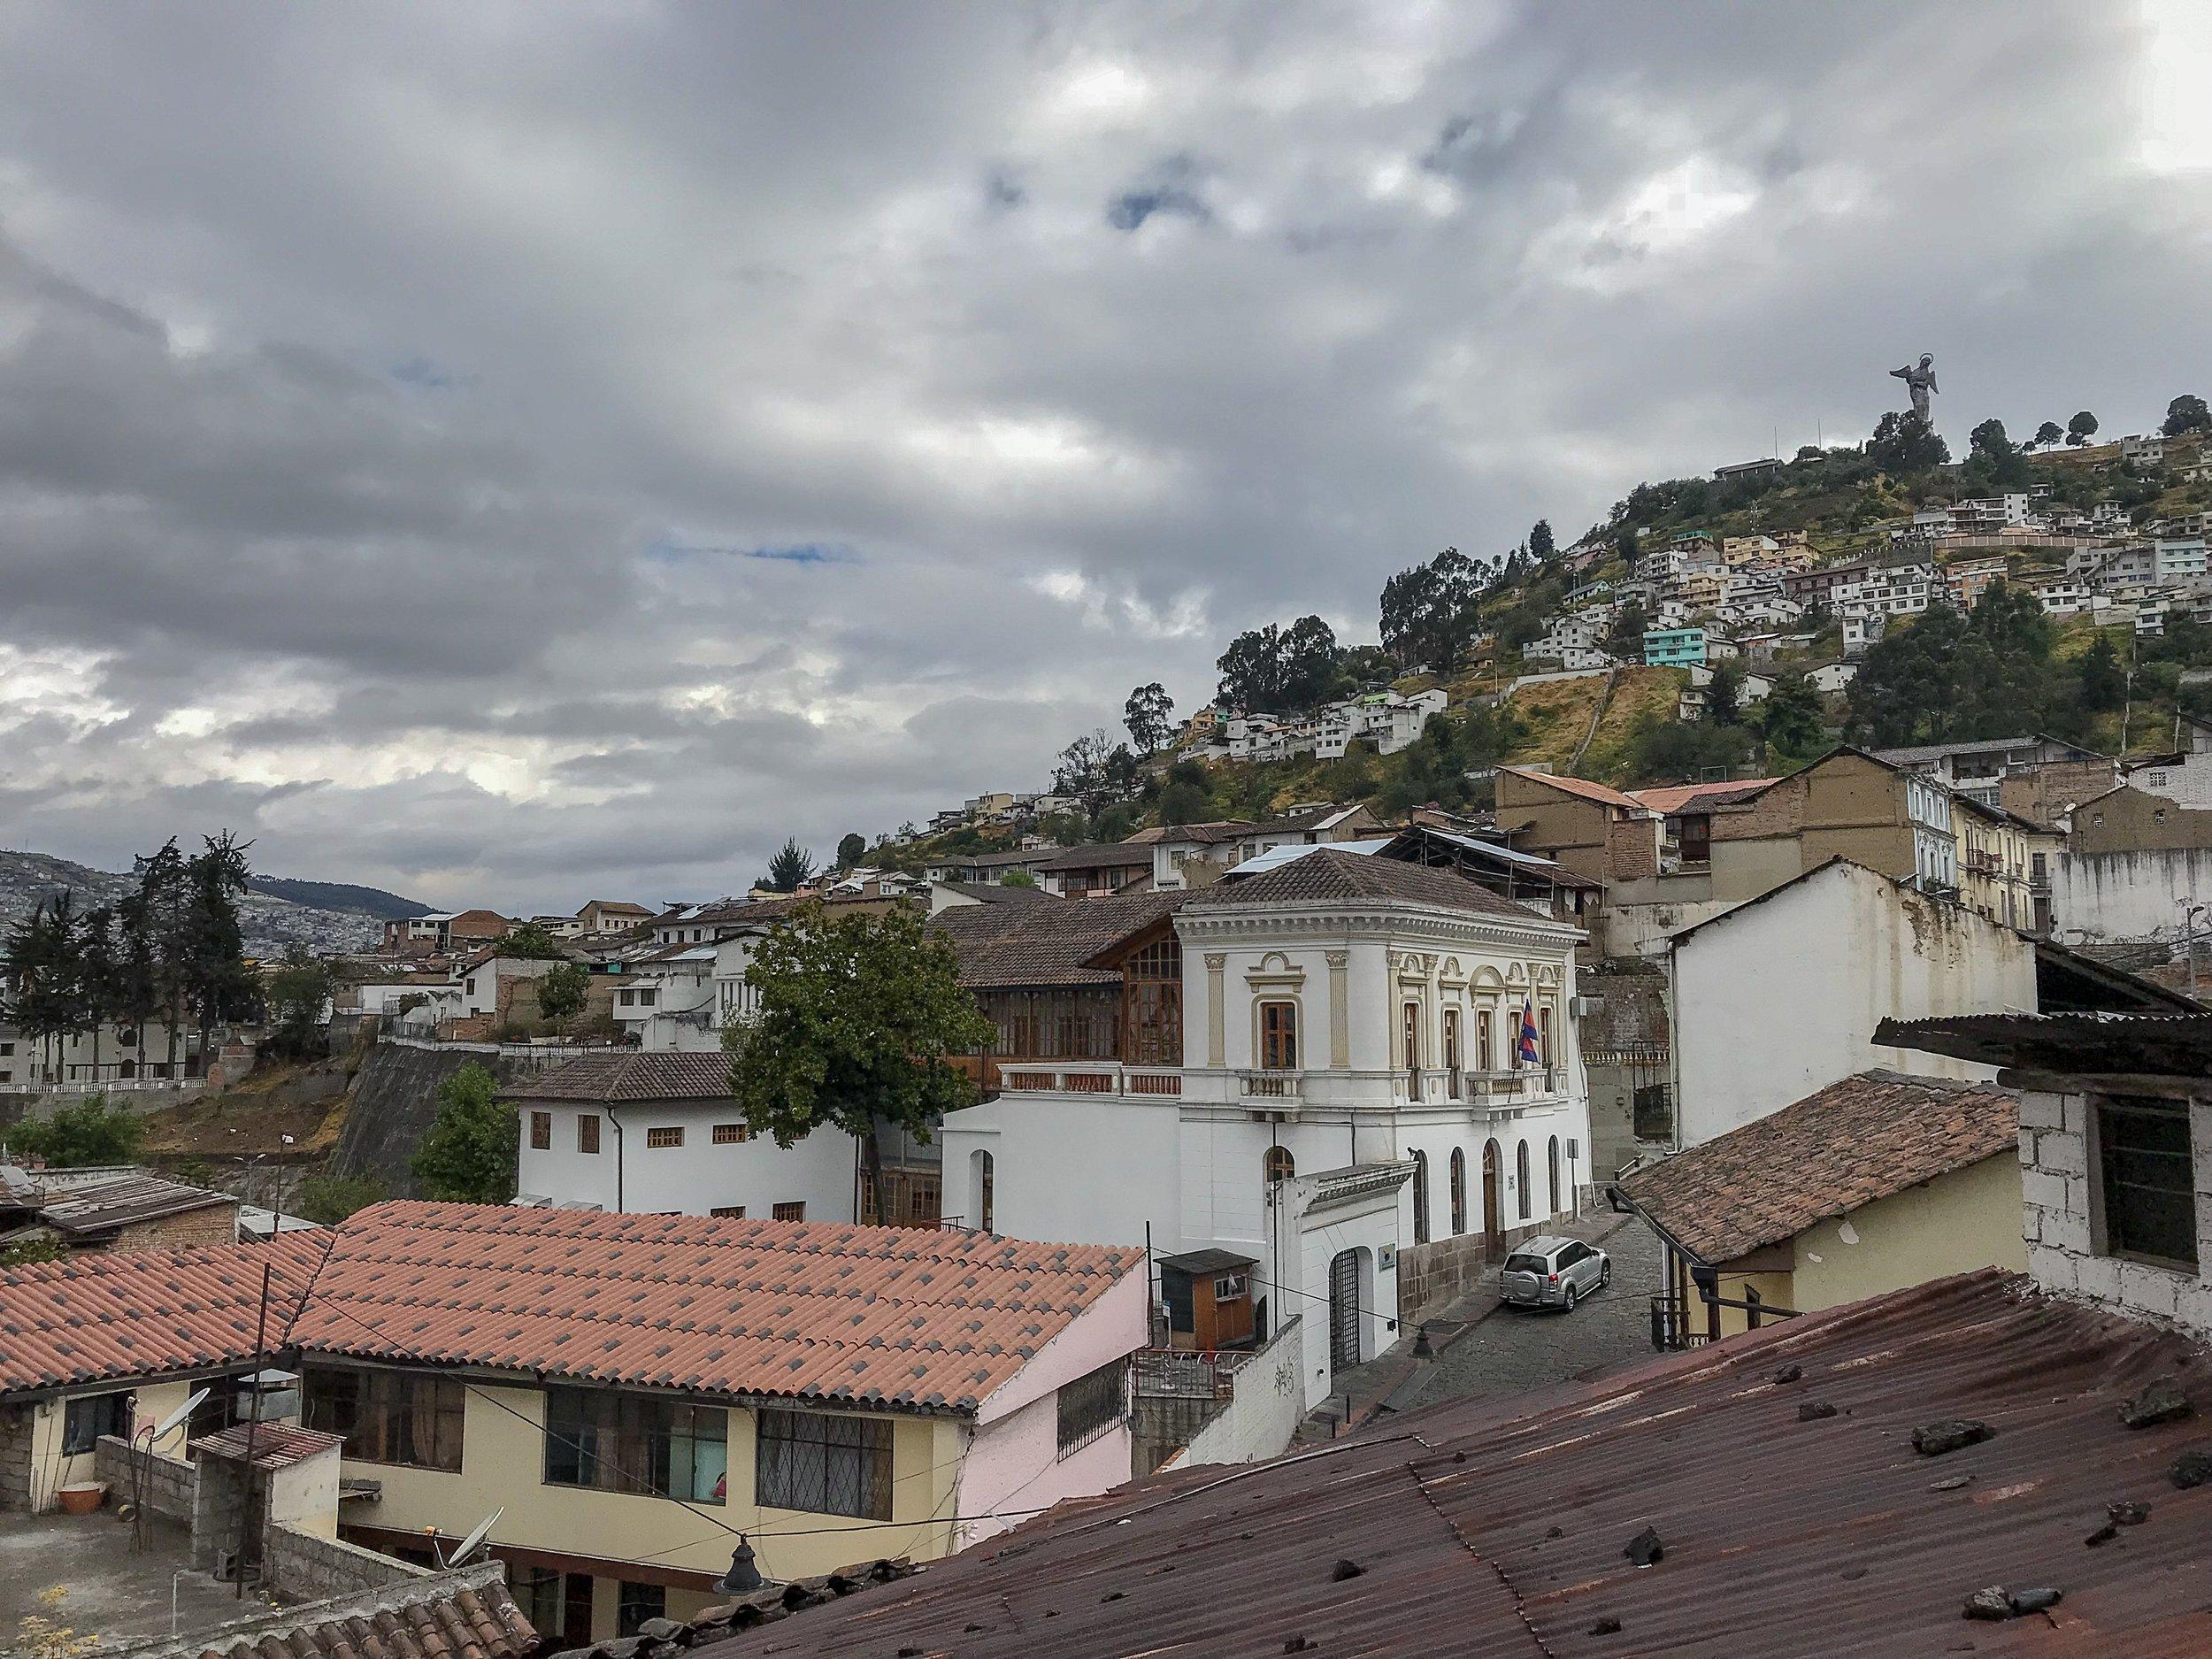 View from Leña Quiteña